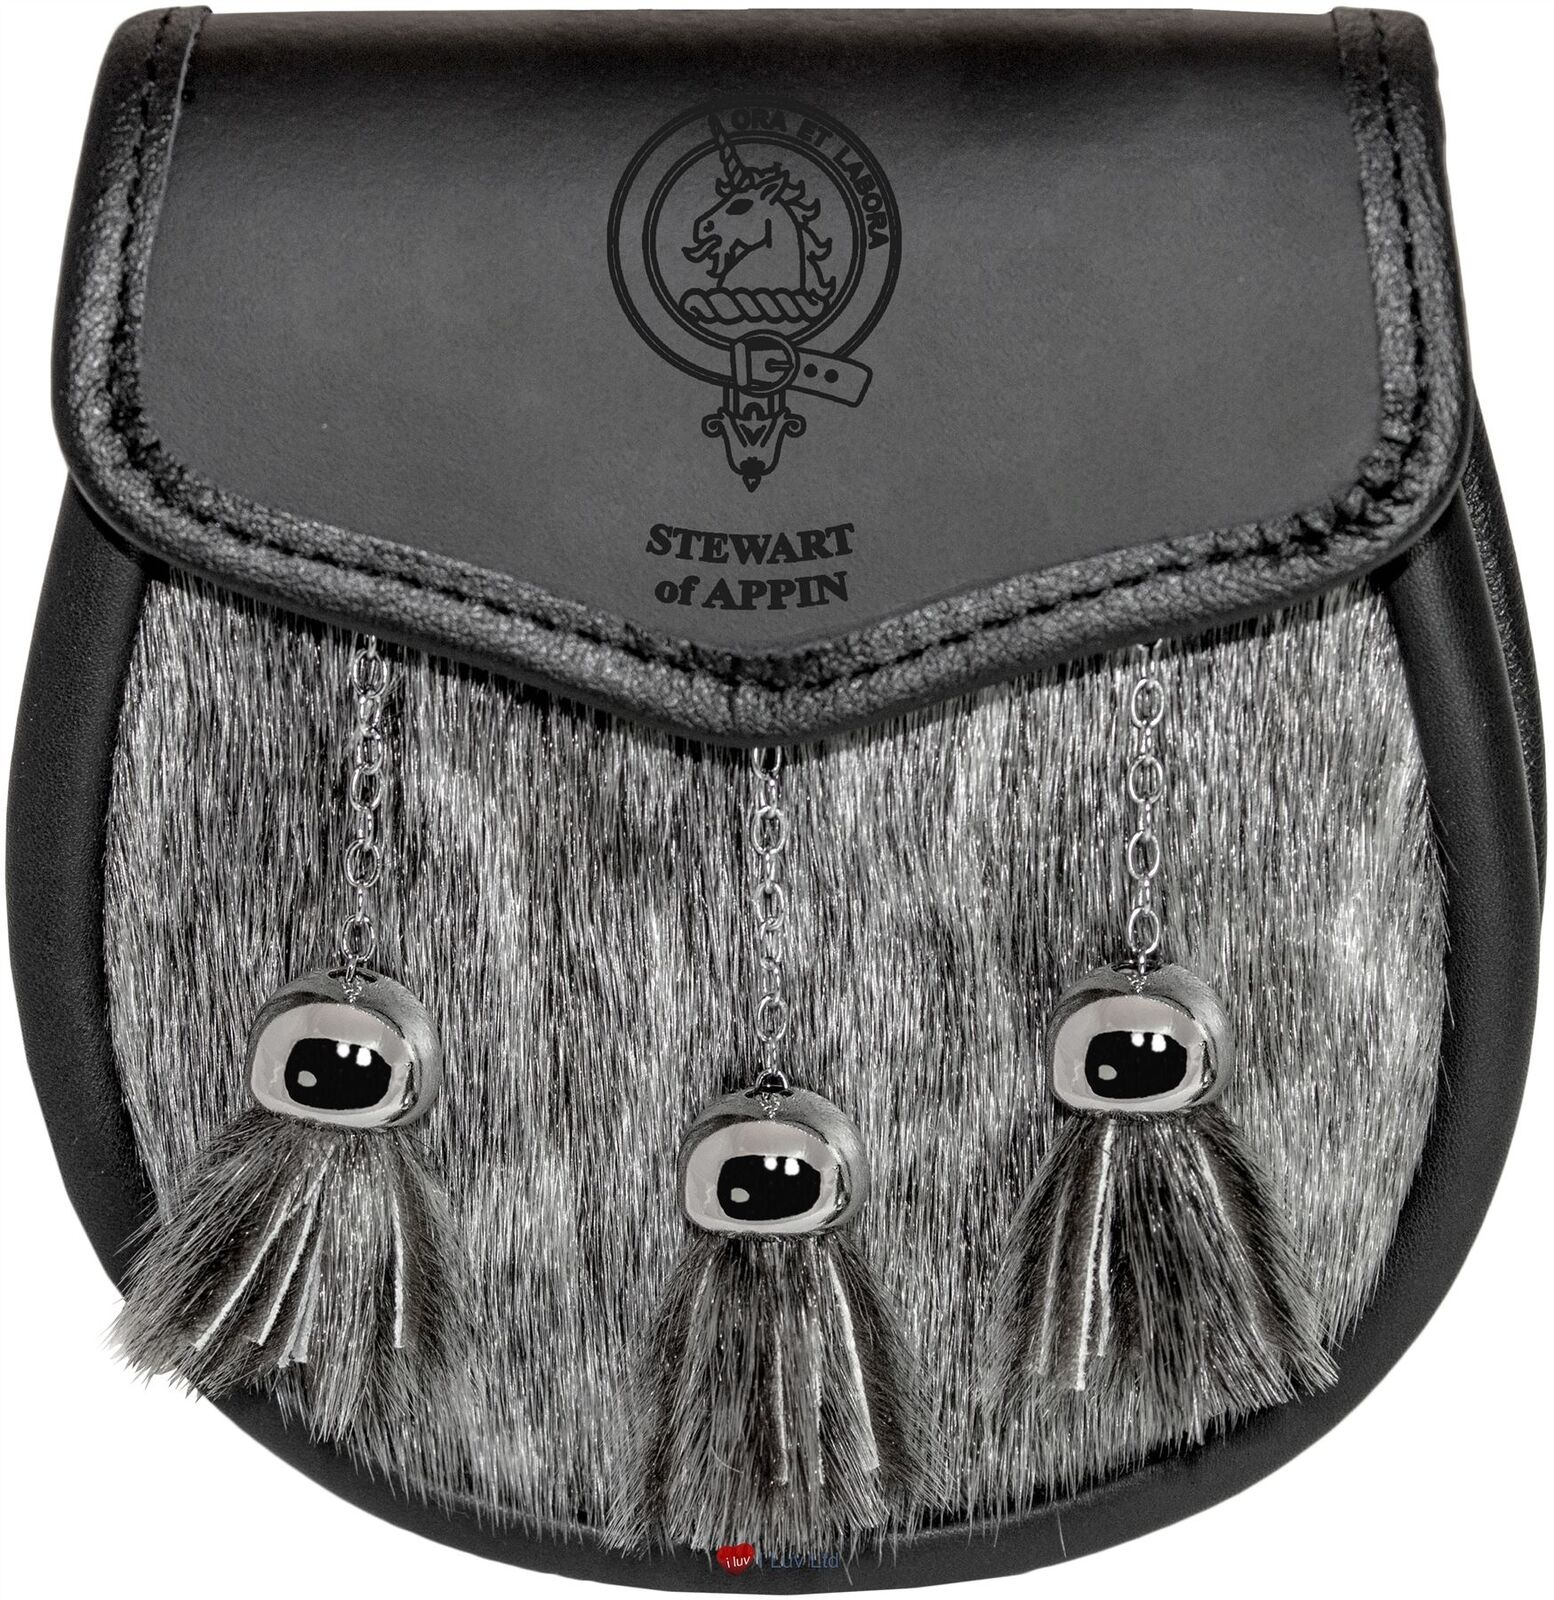 Stewart of Appin Sporran Fur Plain Leather Flap Scottish Clan Crest